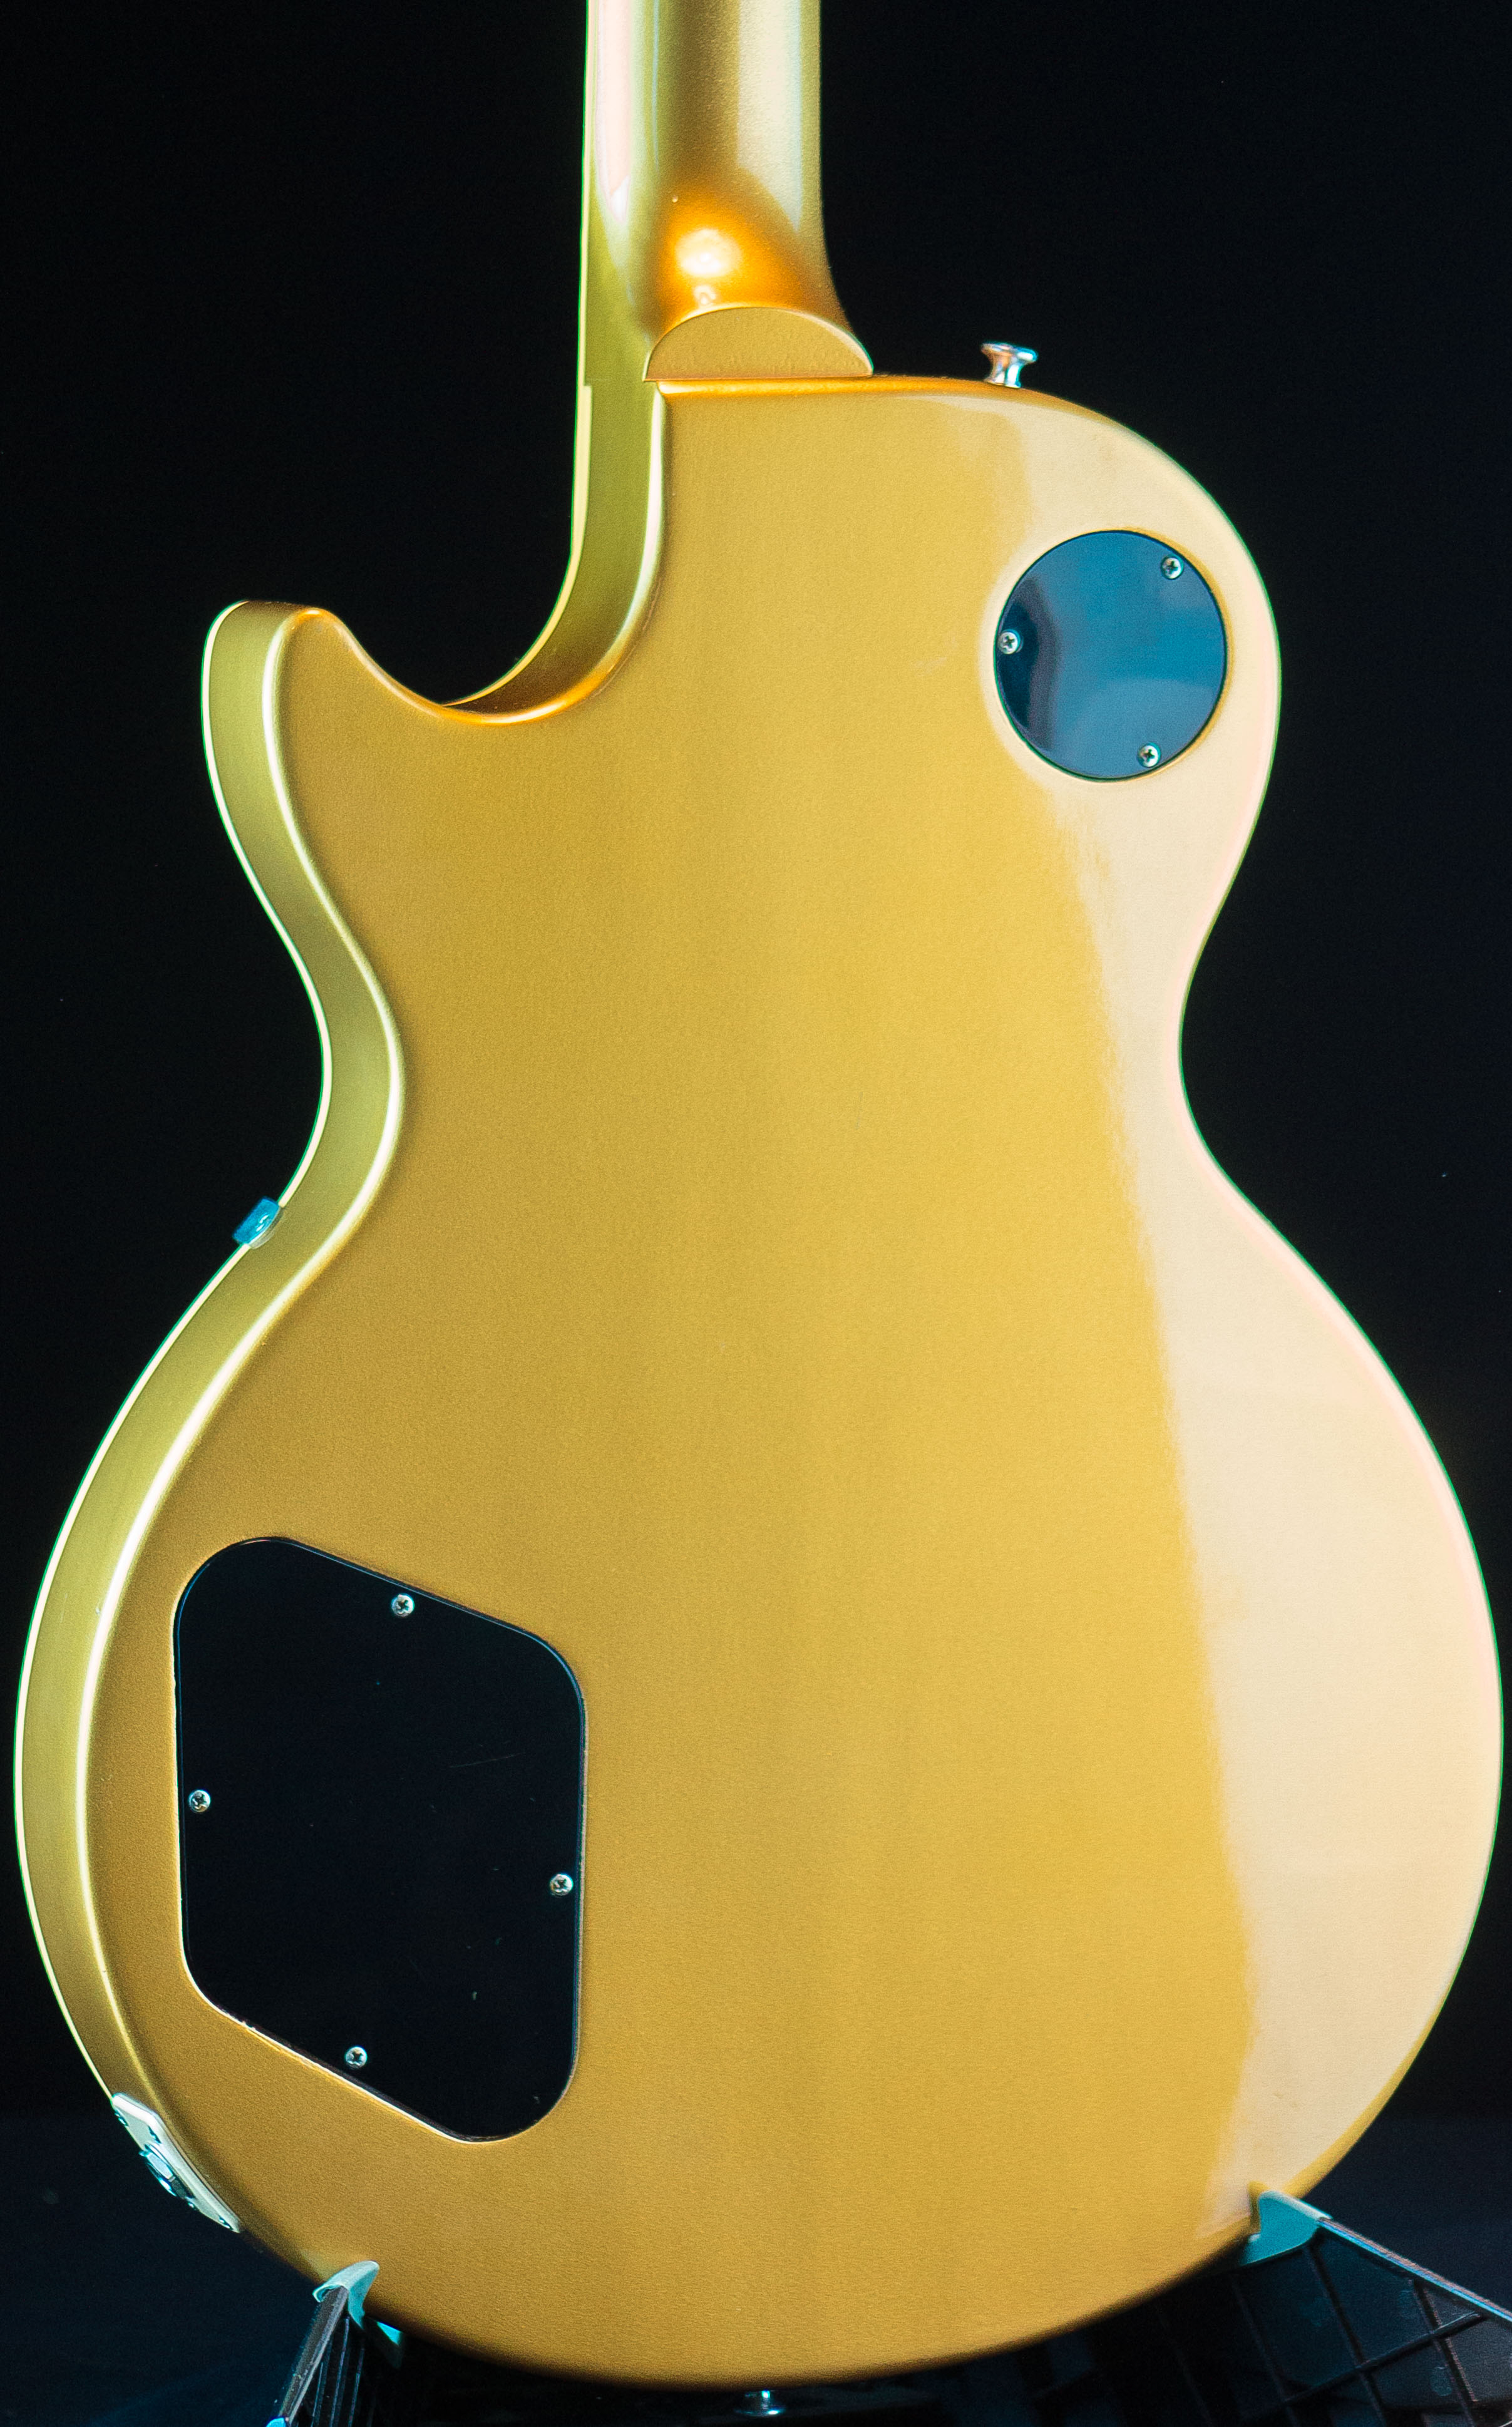 gibson 500t pickup wiring diagram 2001 chevy impala radio 1991 les paul classic goldtop bullion guitar